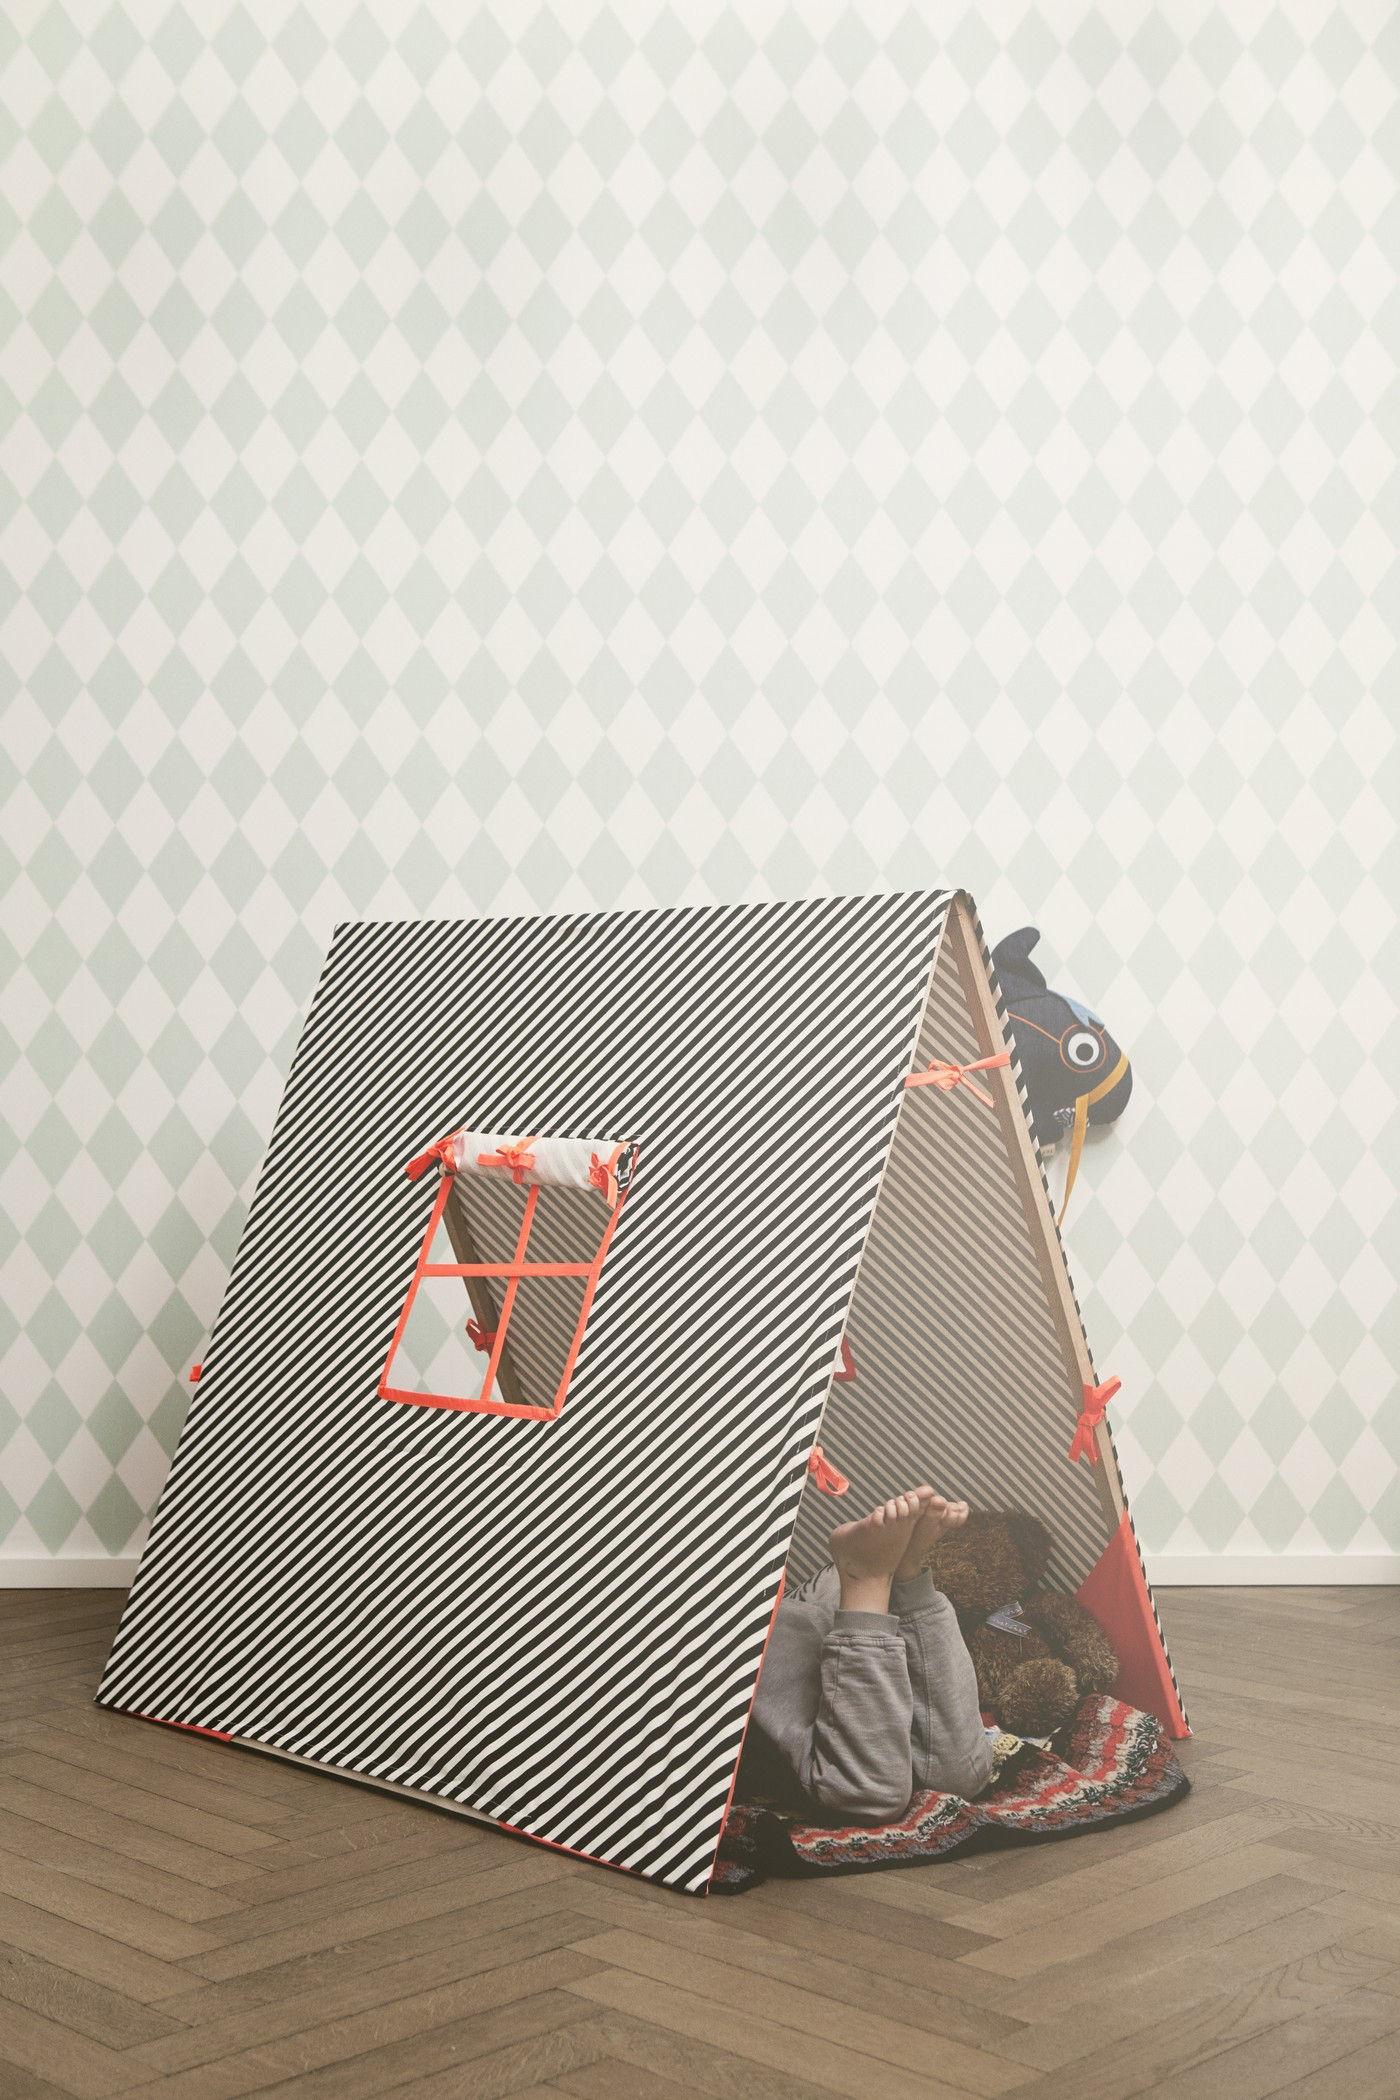 tente kids pour enfants noir blanc rose fluo ferm living. Black Bedroom Furniture Sets. Home Design Ideas